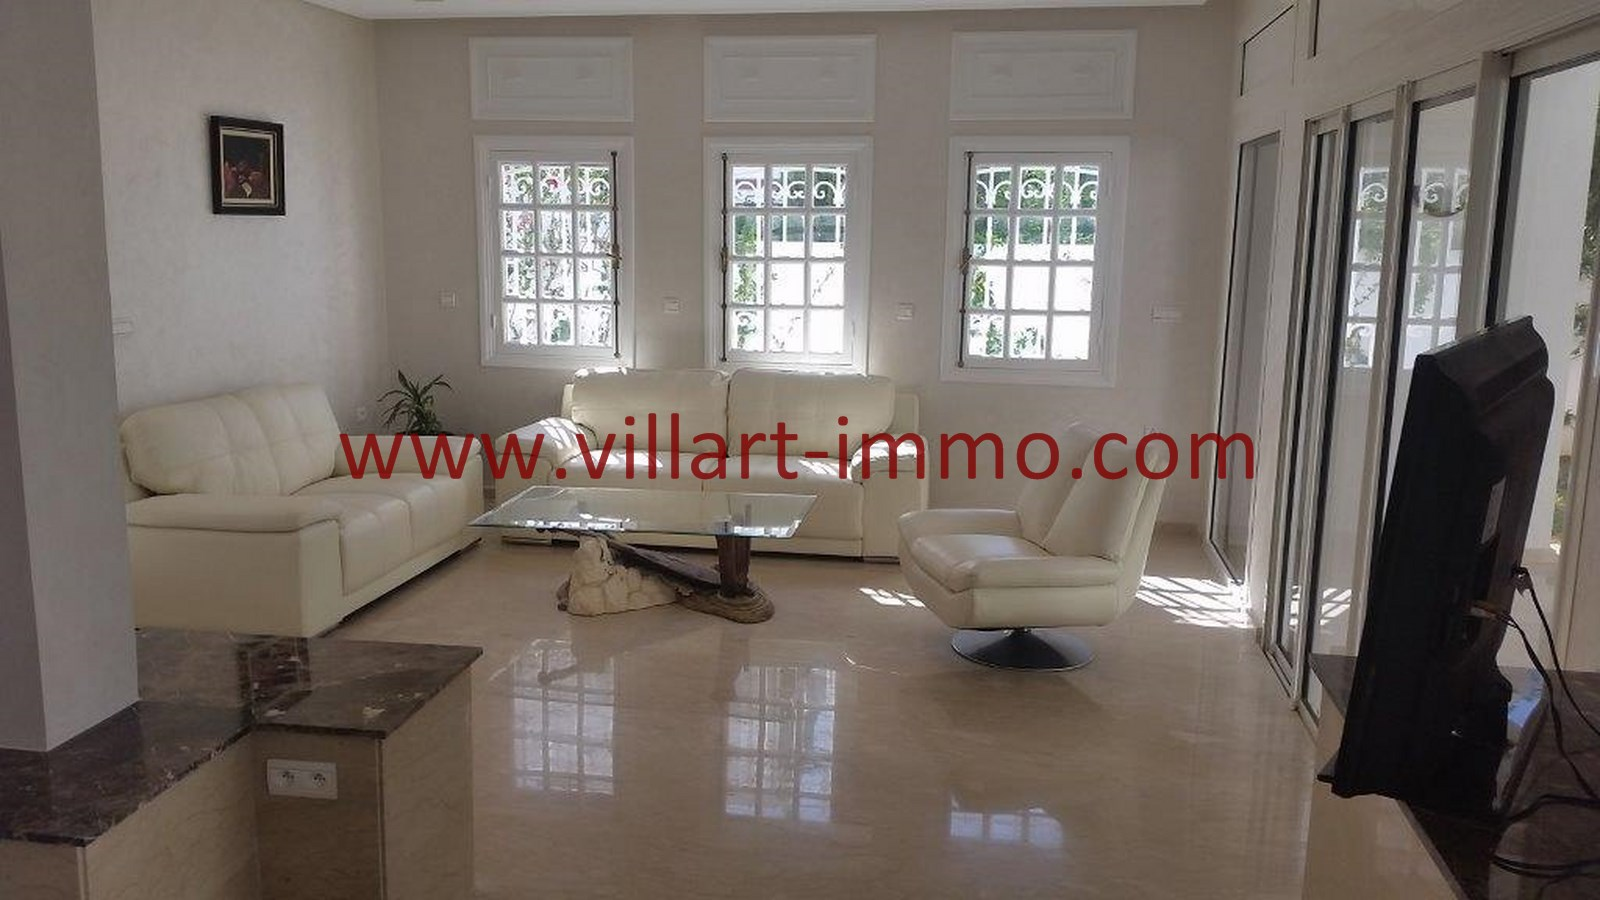 4-vente-villa-tanger-la-montagne-salon-3-vv450-villart-immo